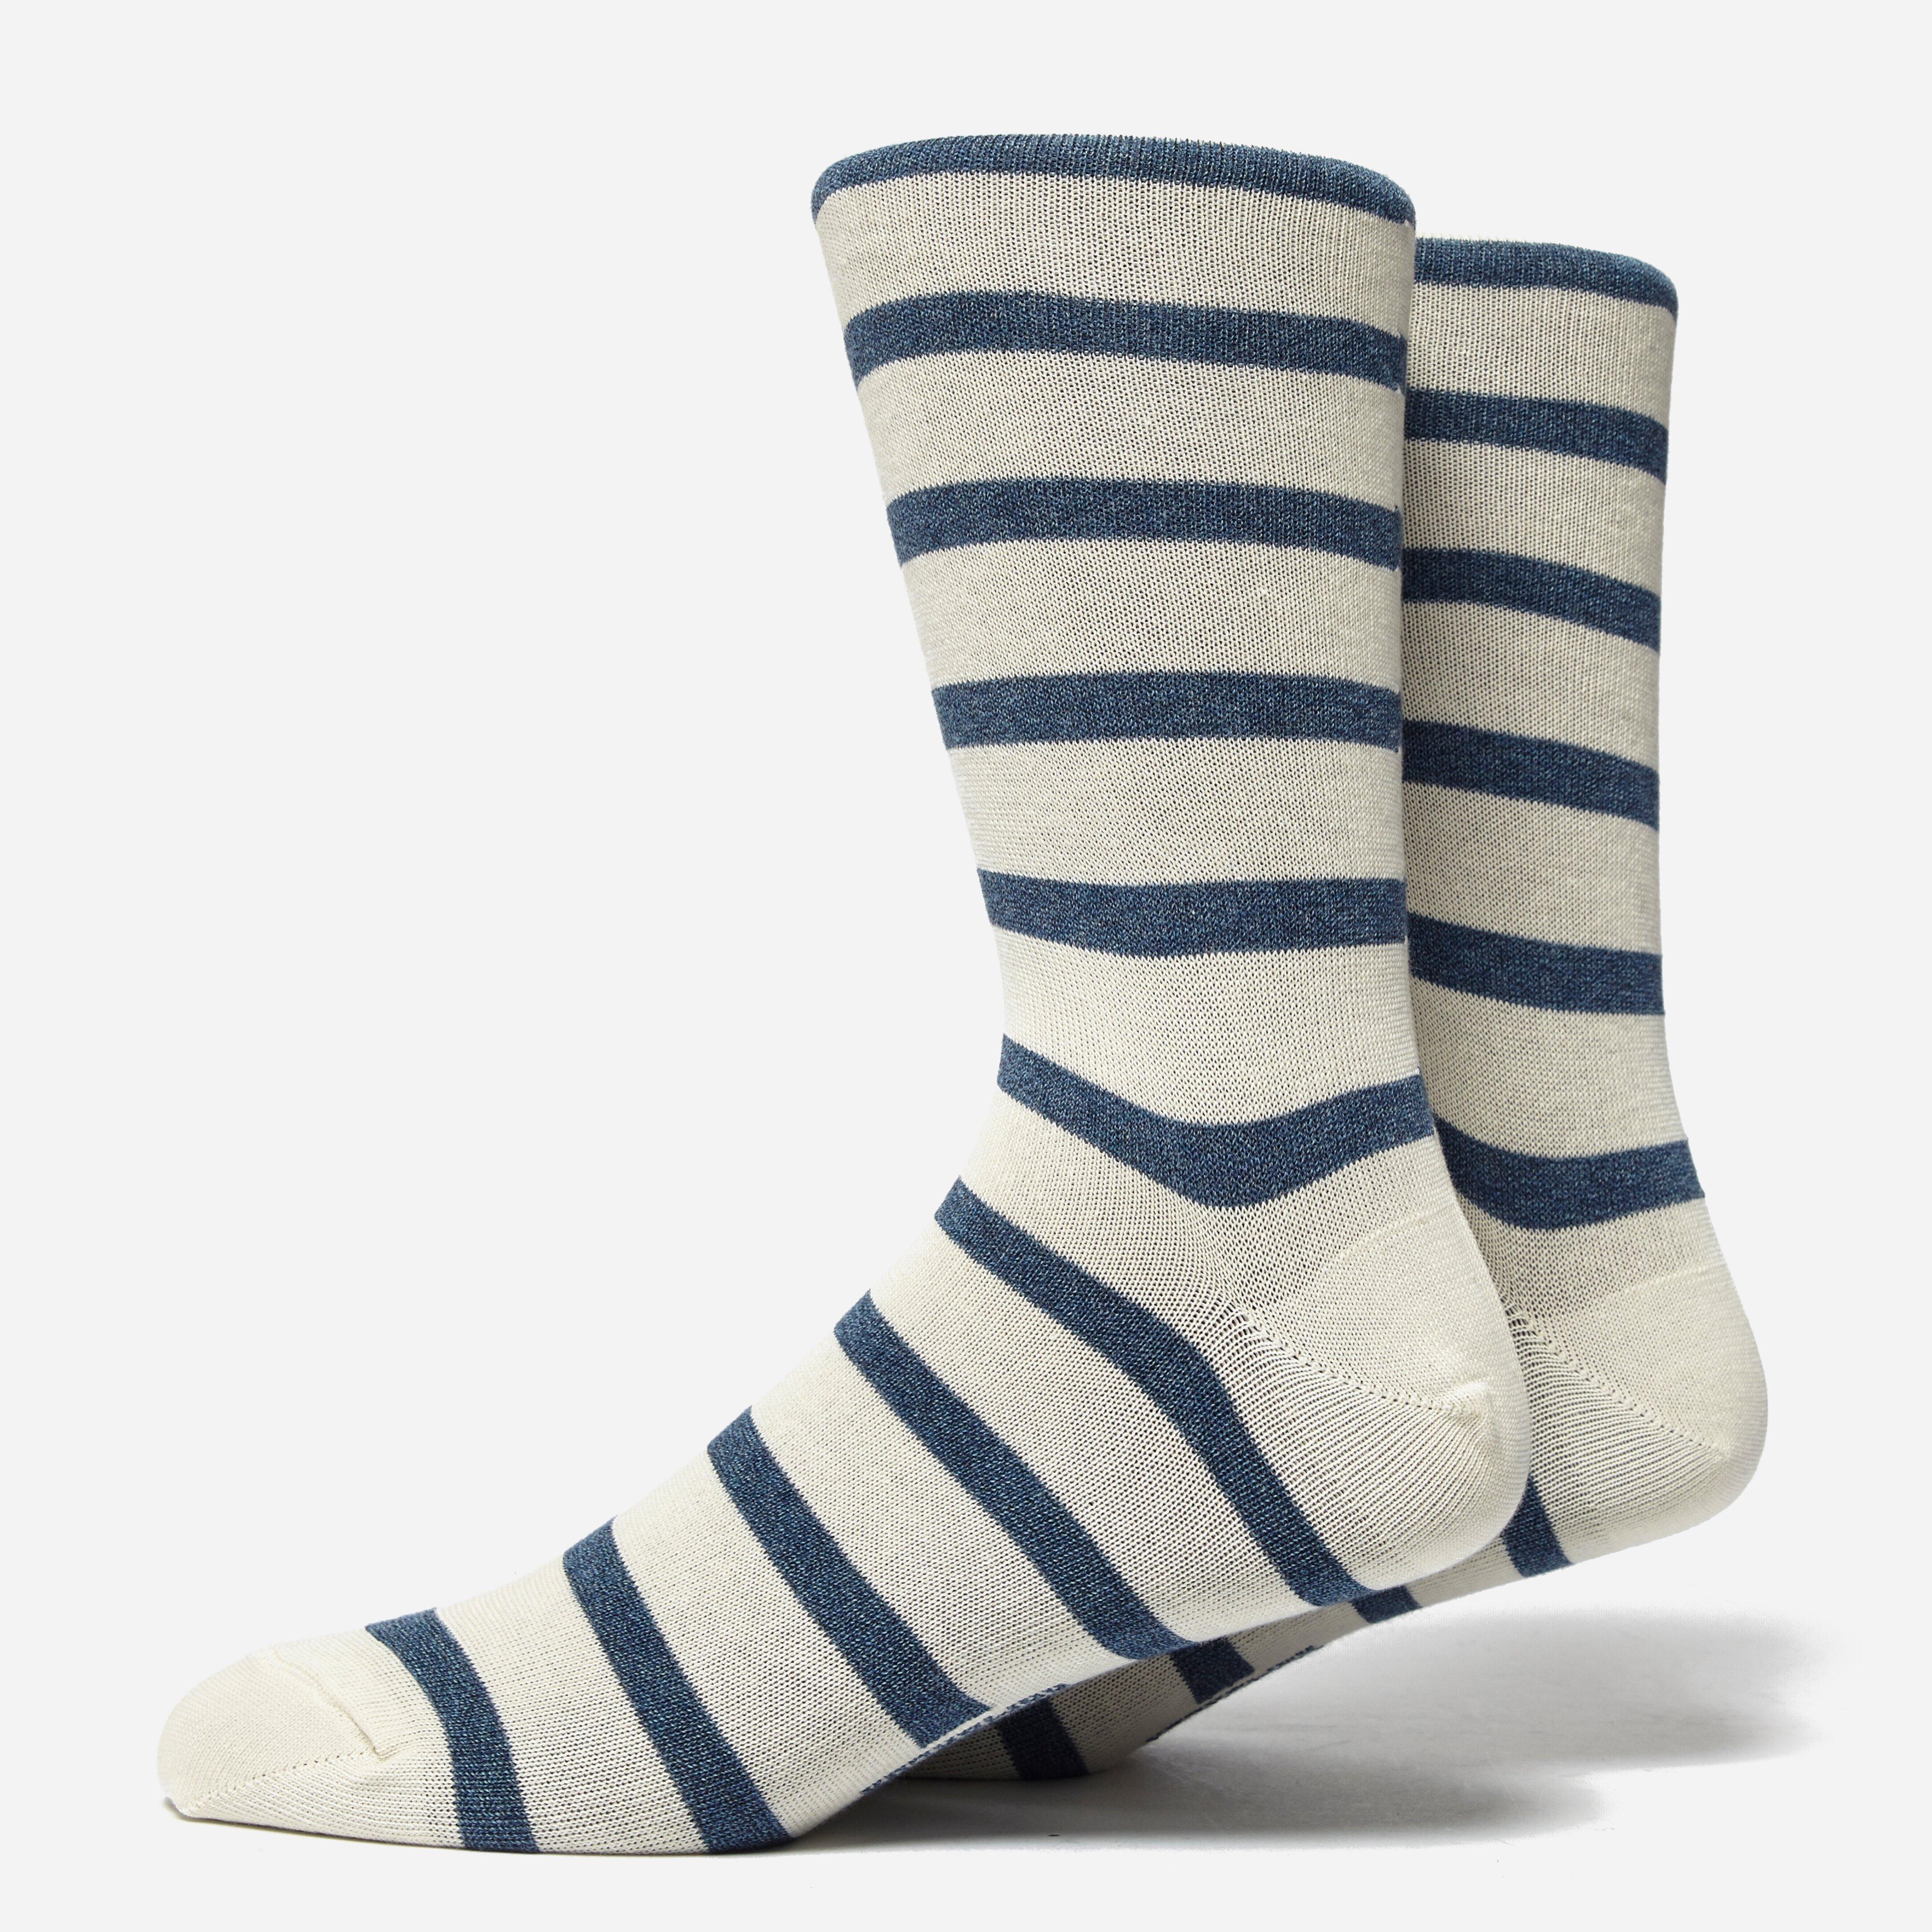 Armor Lux 2270 Striped Socks